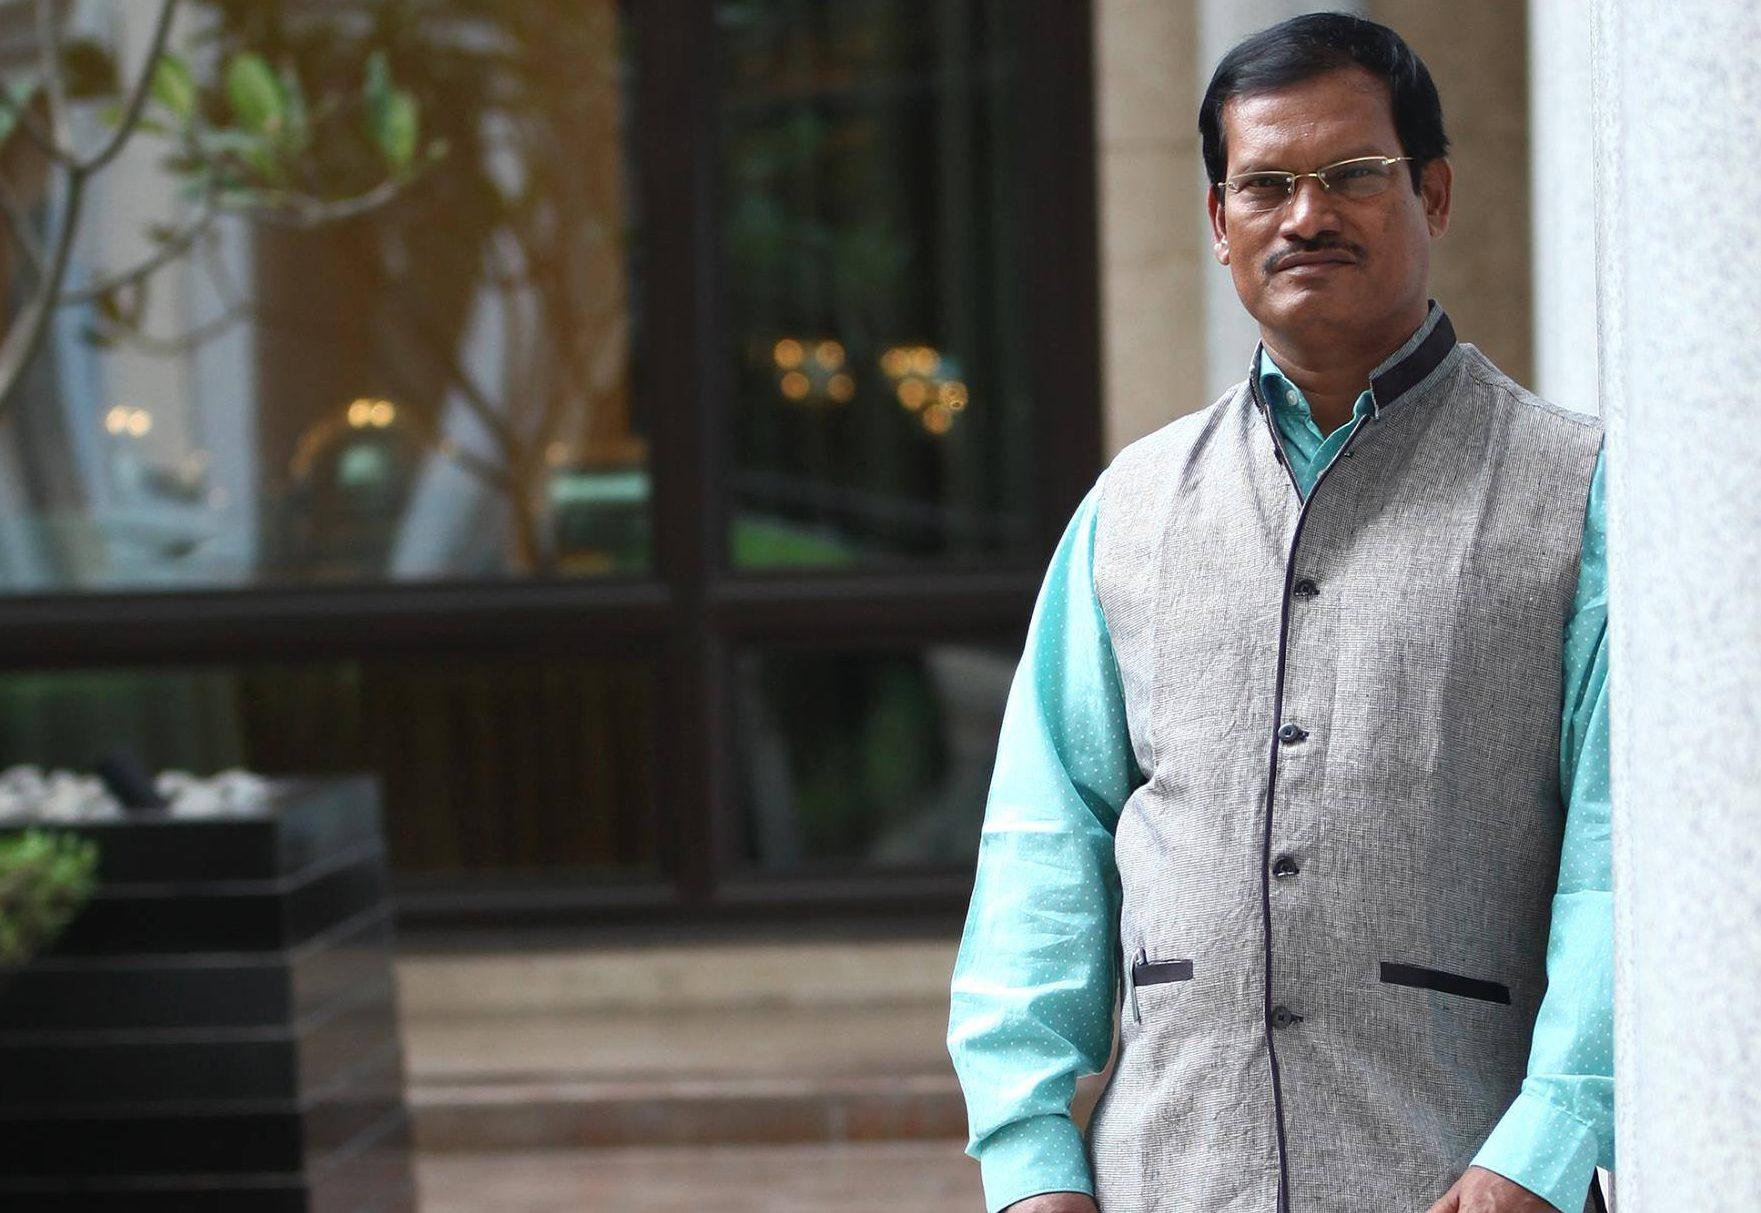 The Real Life Pad Man Arunachalam Murugnatham